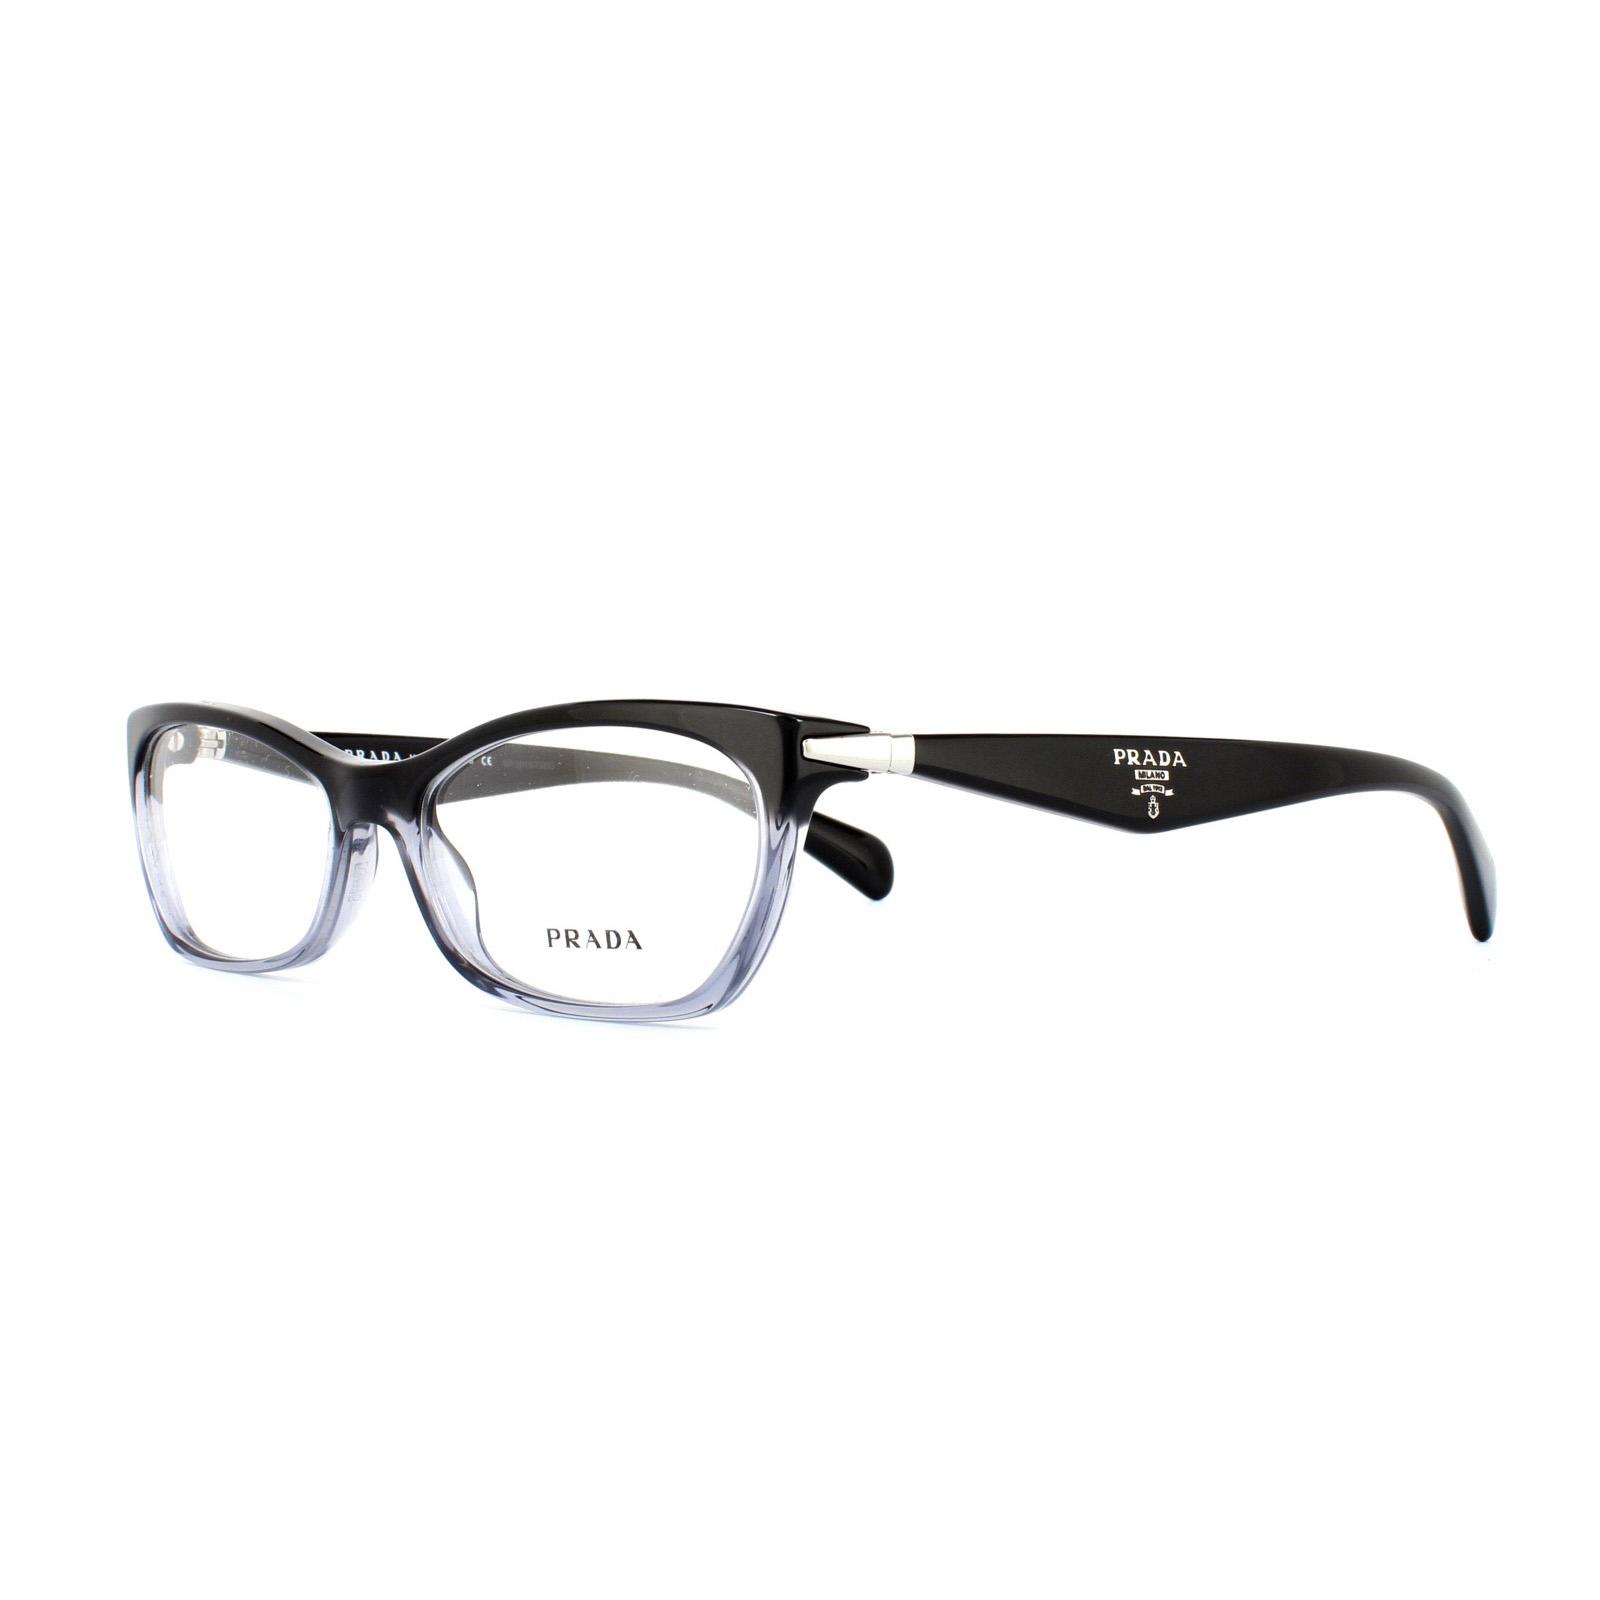 b46171a7eeb5 Glasses Frames Prada Uk